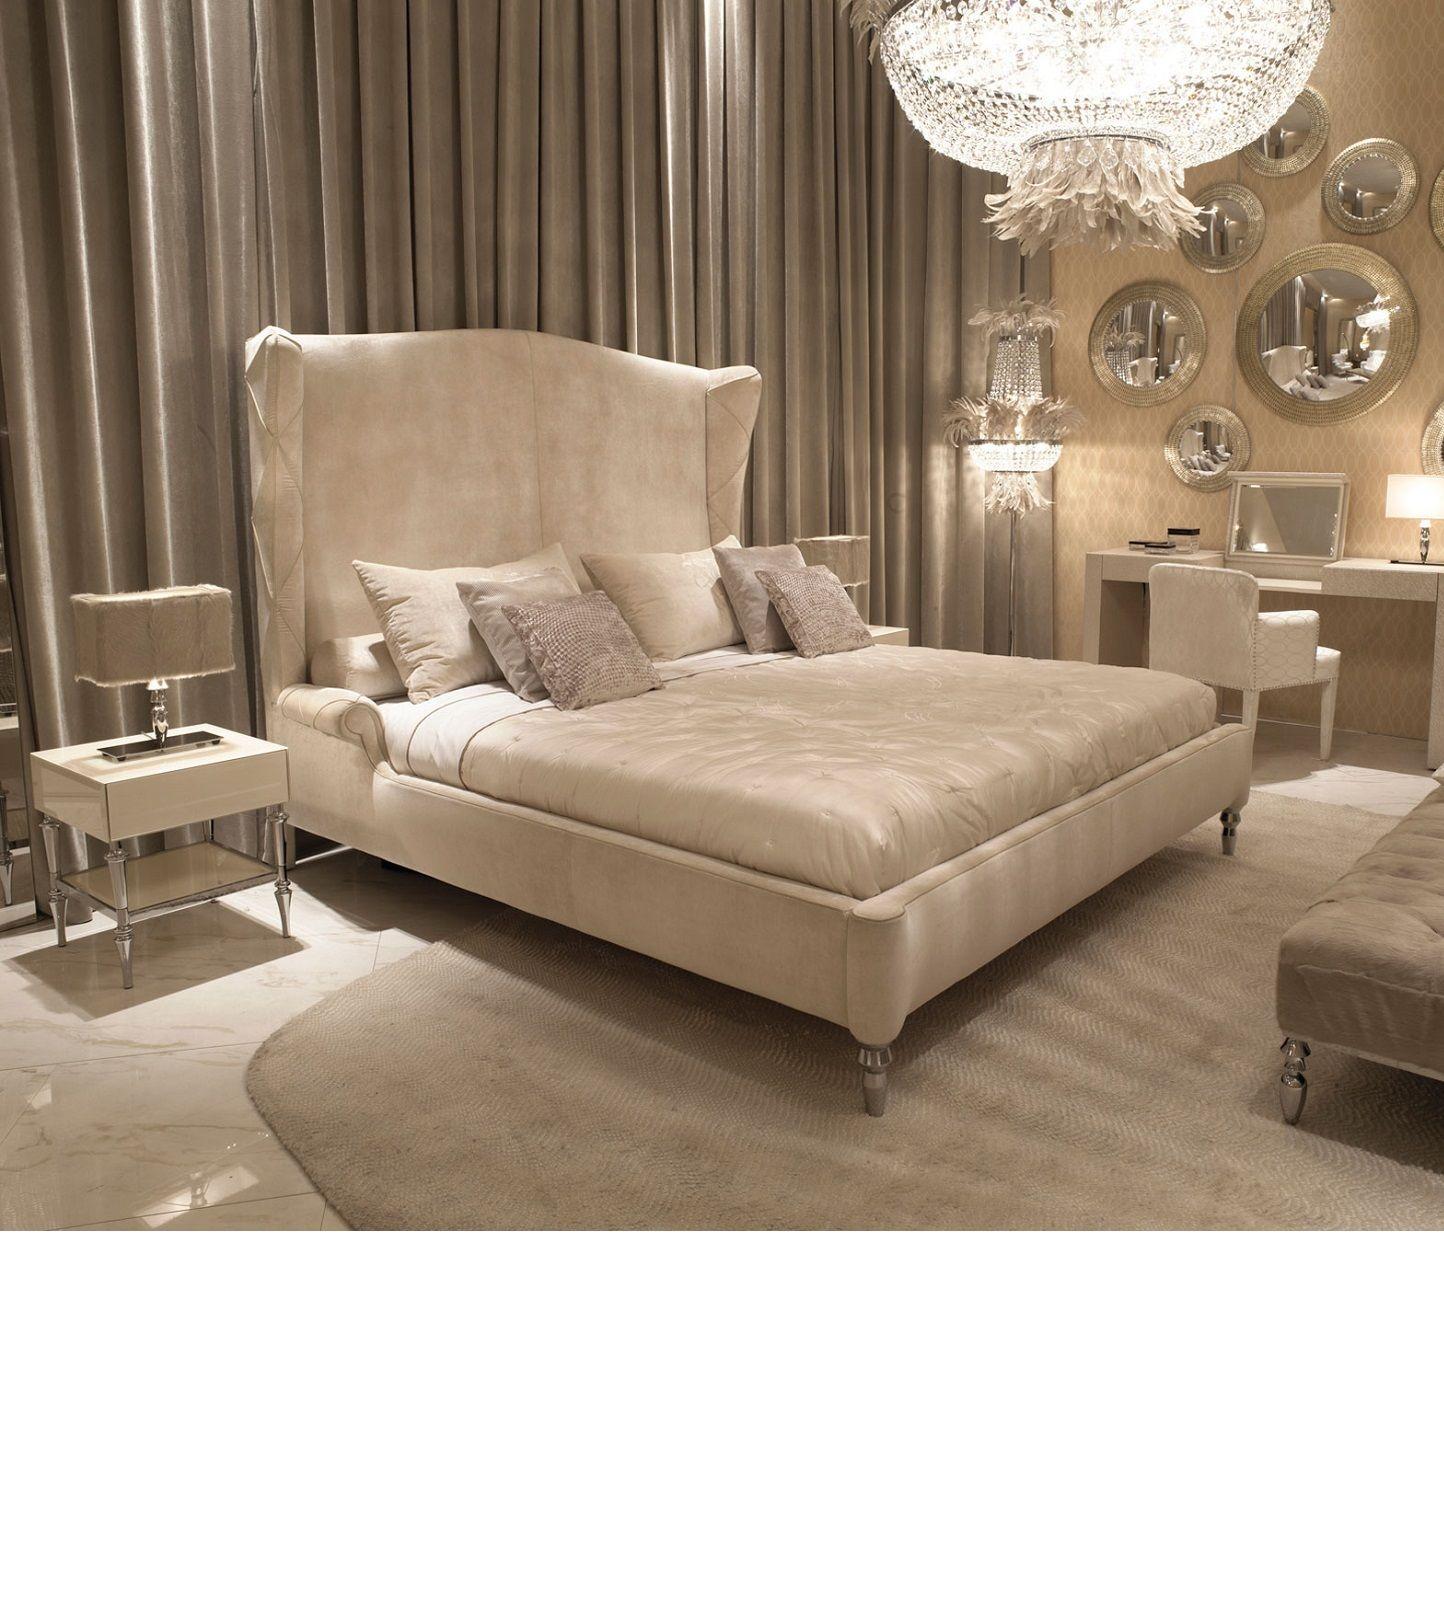 Luxury Bedrooms Luxury Bedroom Furniture Designer Bedroom Furniture By Instyle Decor Com Hollywood Luxurious Bedrooms Luxury Furniture Luxury Home Decor